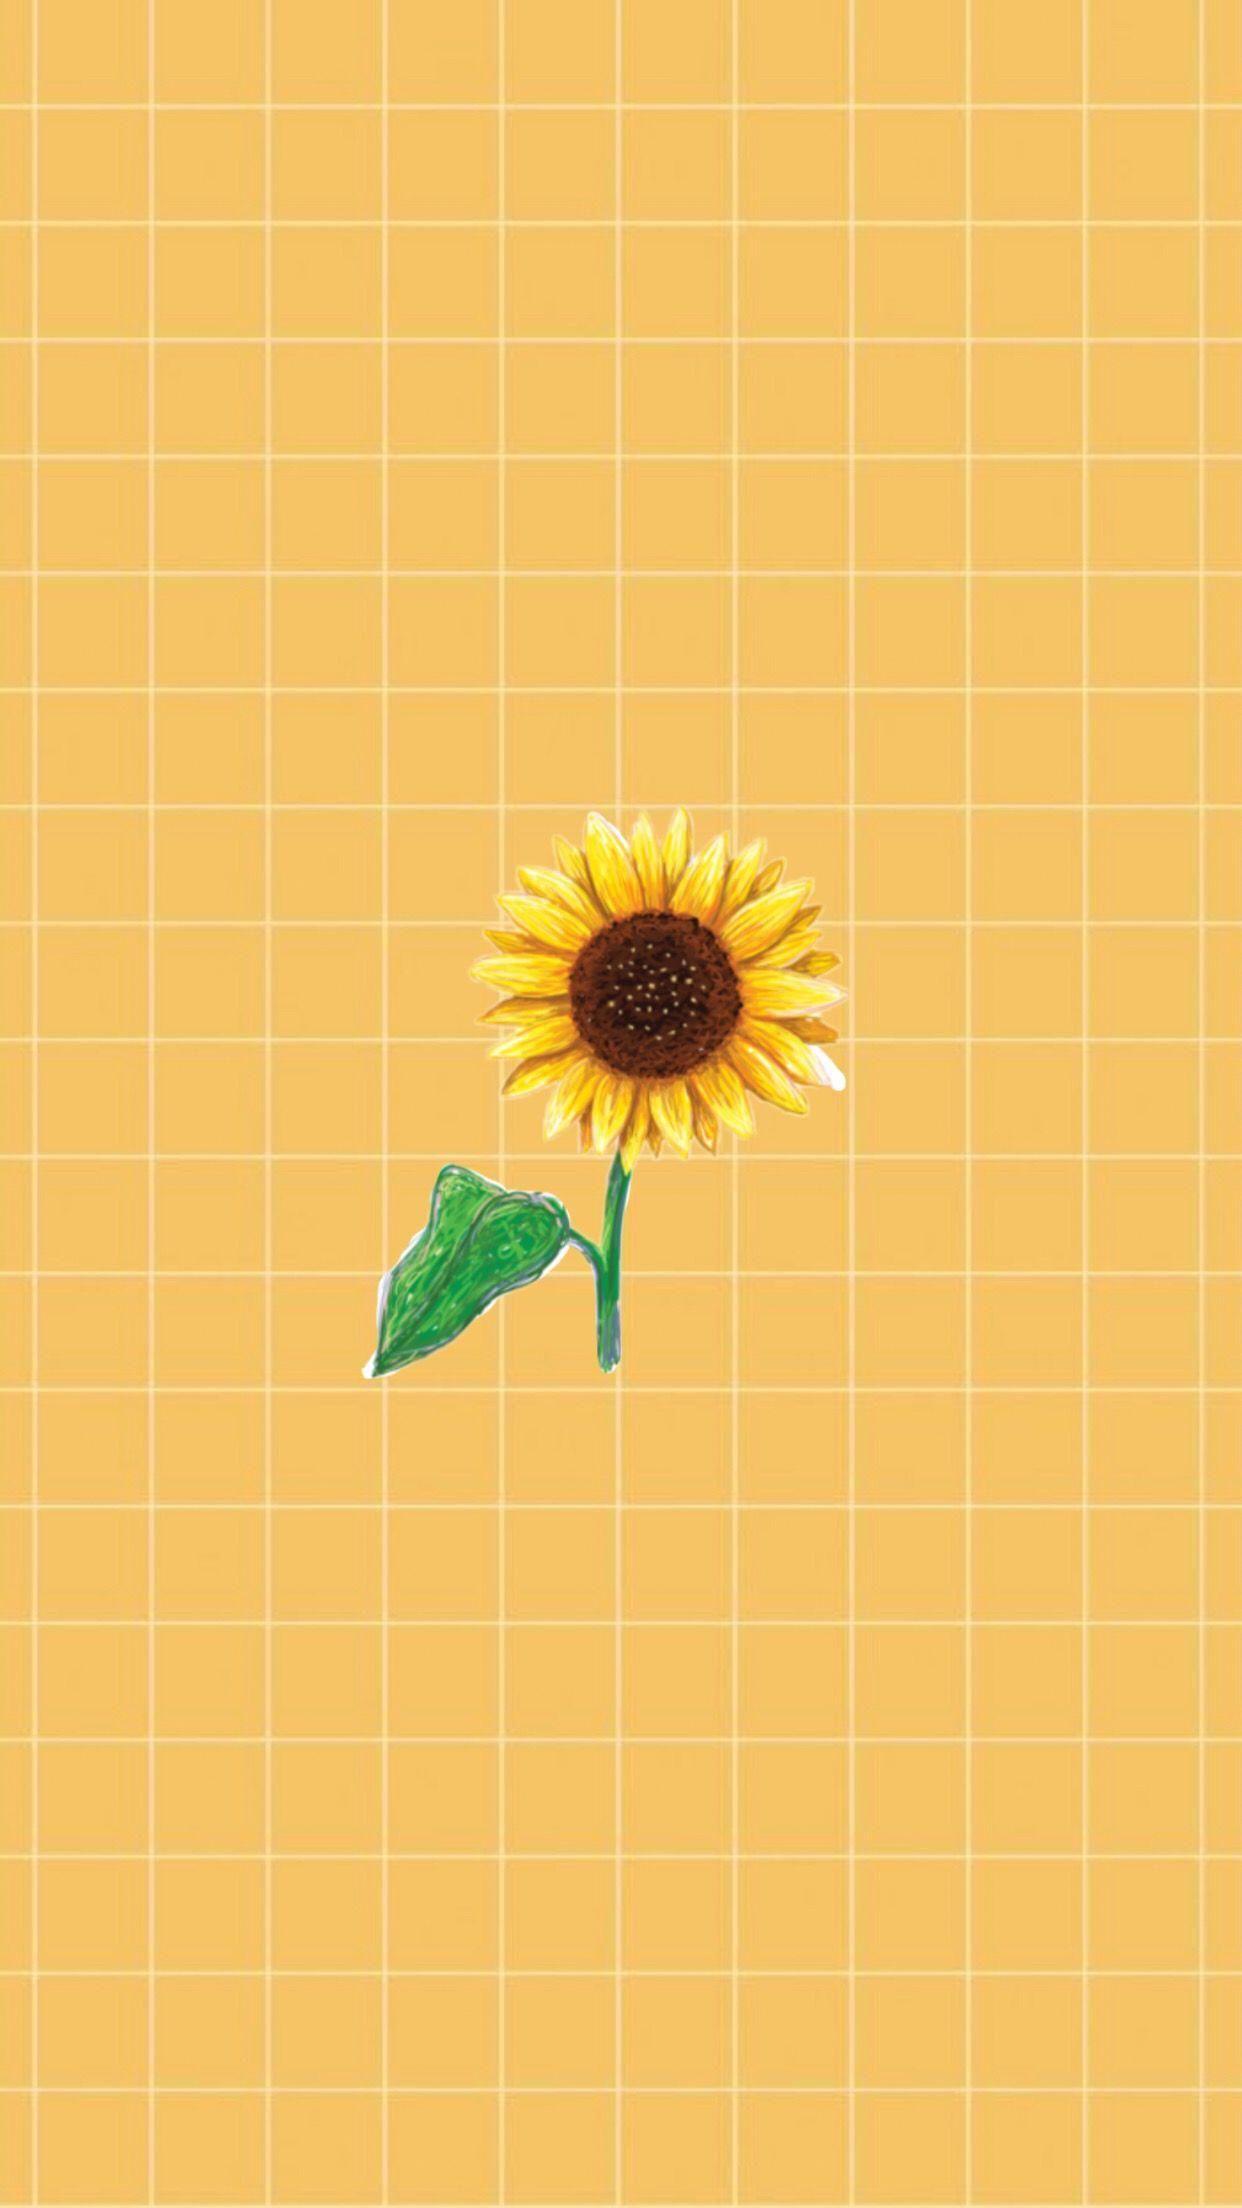 Tumblr Wallpaper Yellow Sunflower Iphonewallpapertumblr Sunflower Wallpaper Yellow Wallpaper Aesthetic Iphone Wallpaper